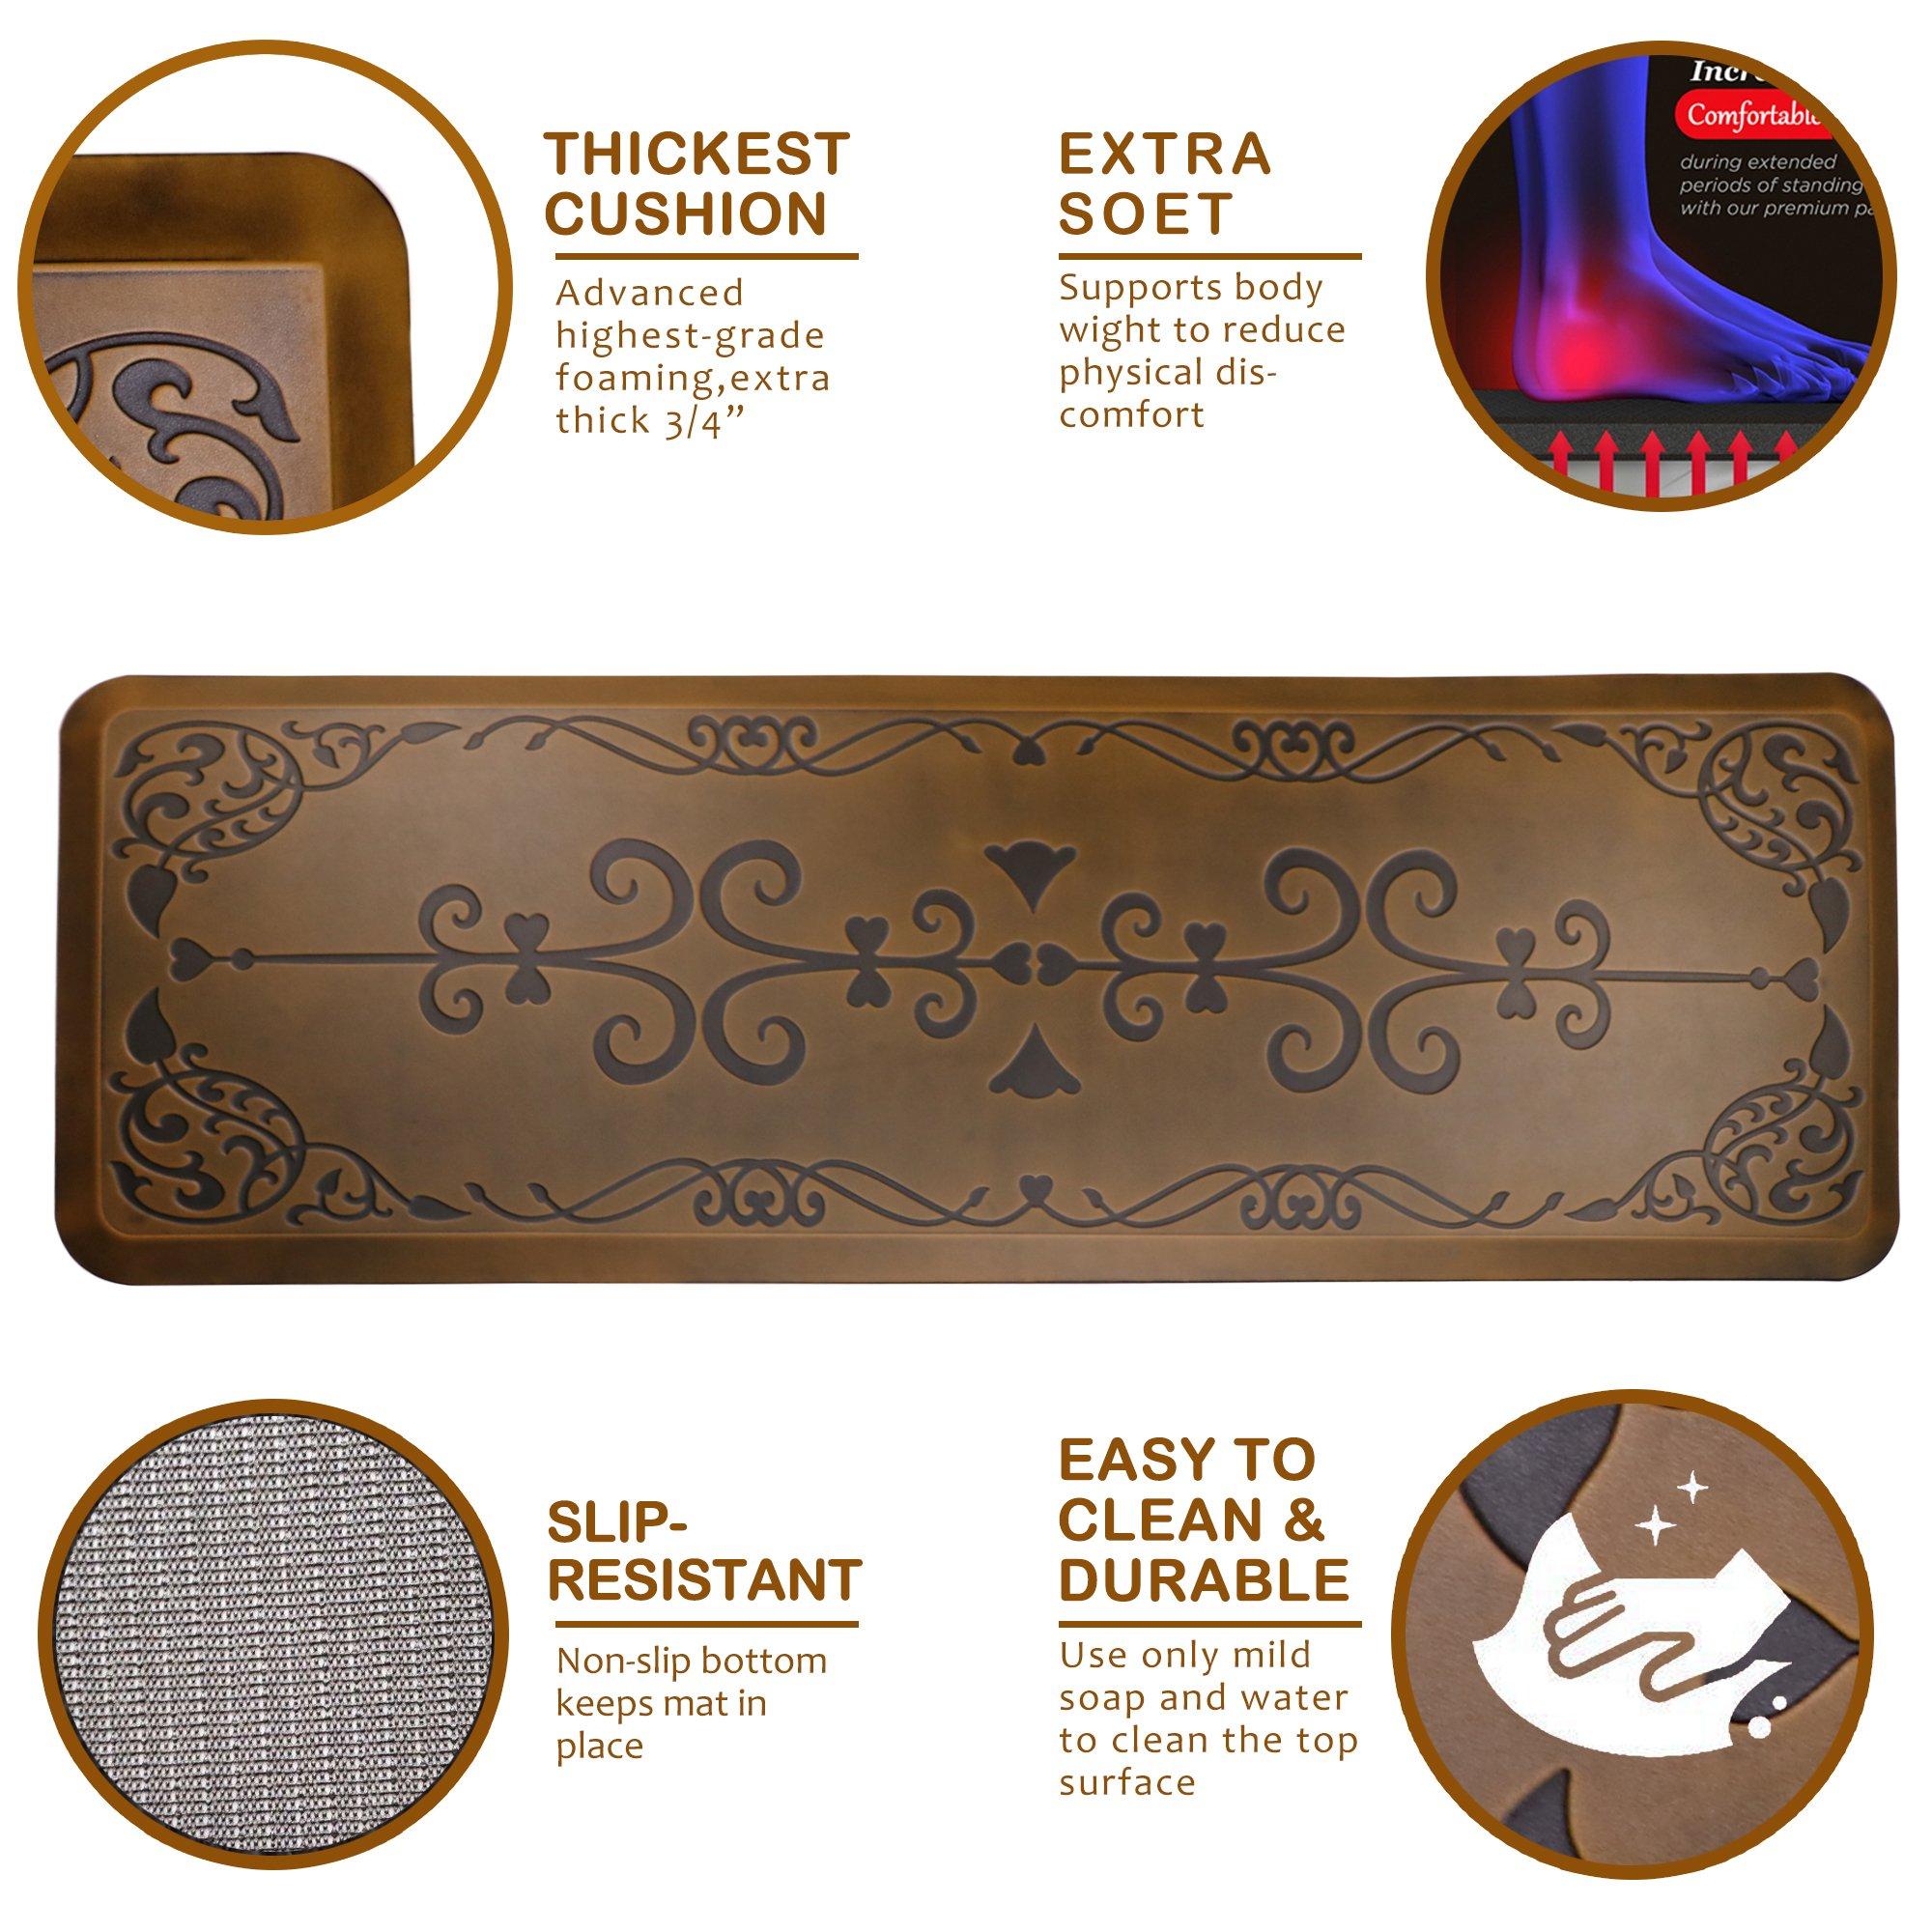 AMCOMFY Kitchen Anti Fatigue Mat,Comfort Floor Mats,Standing Desk Mats,Antique Series (24''x70''x3/4'', Love Flower Brown) by Amcomfy (Image #2)